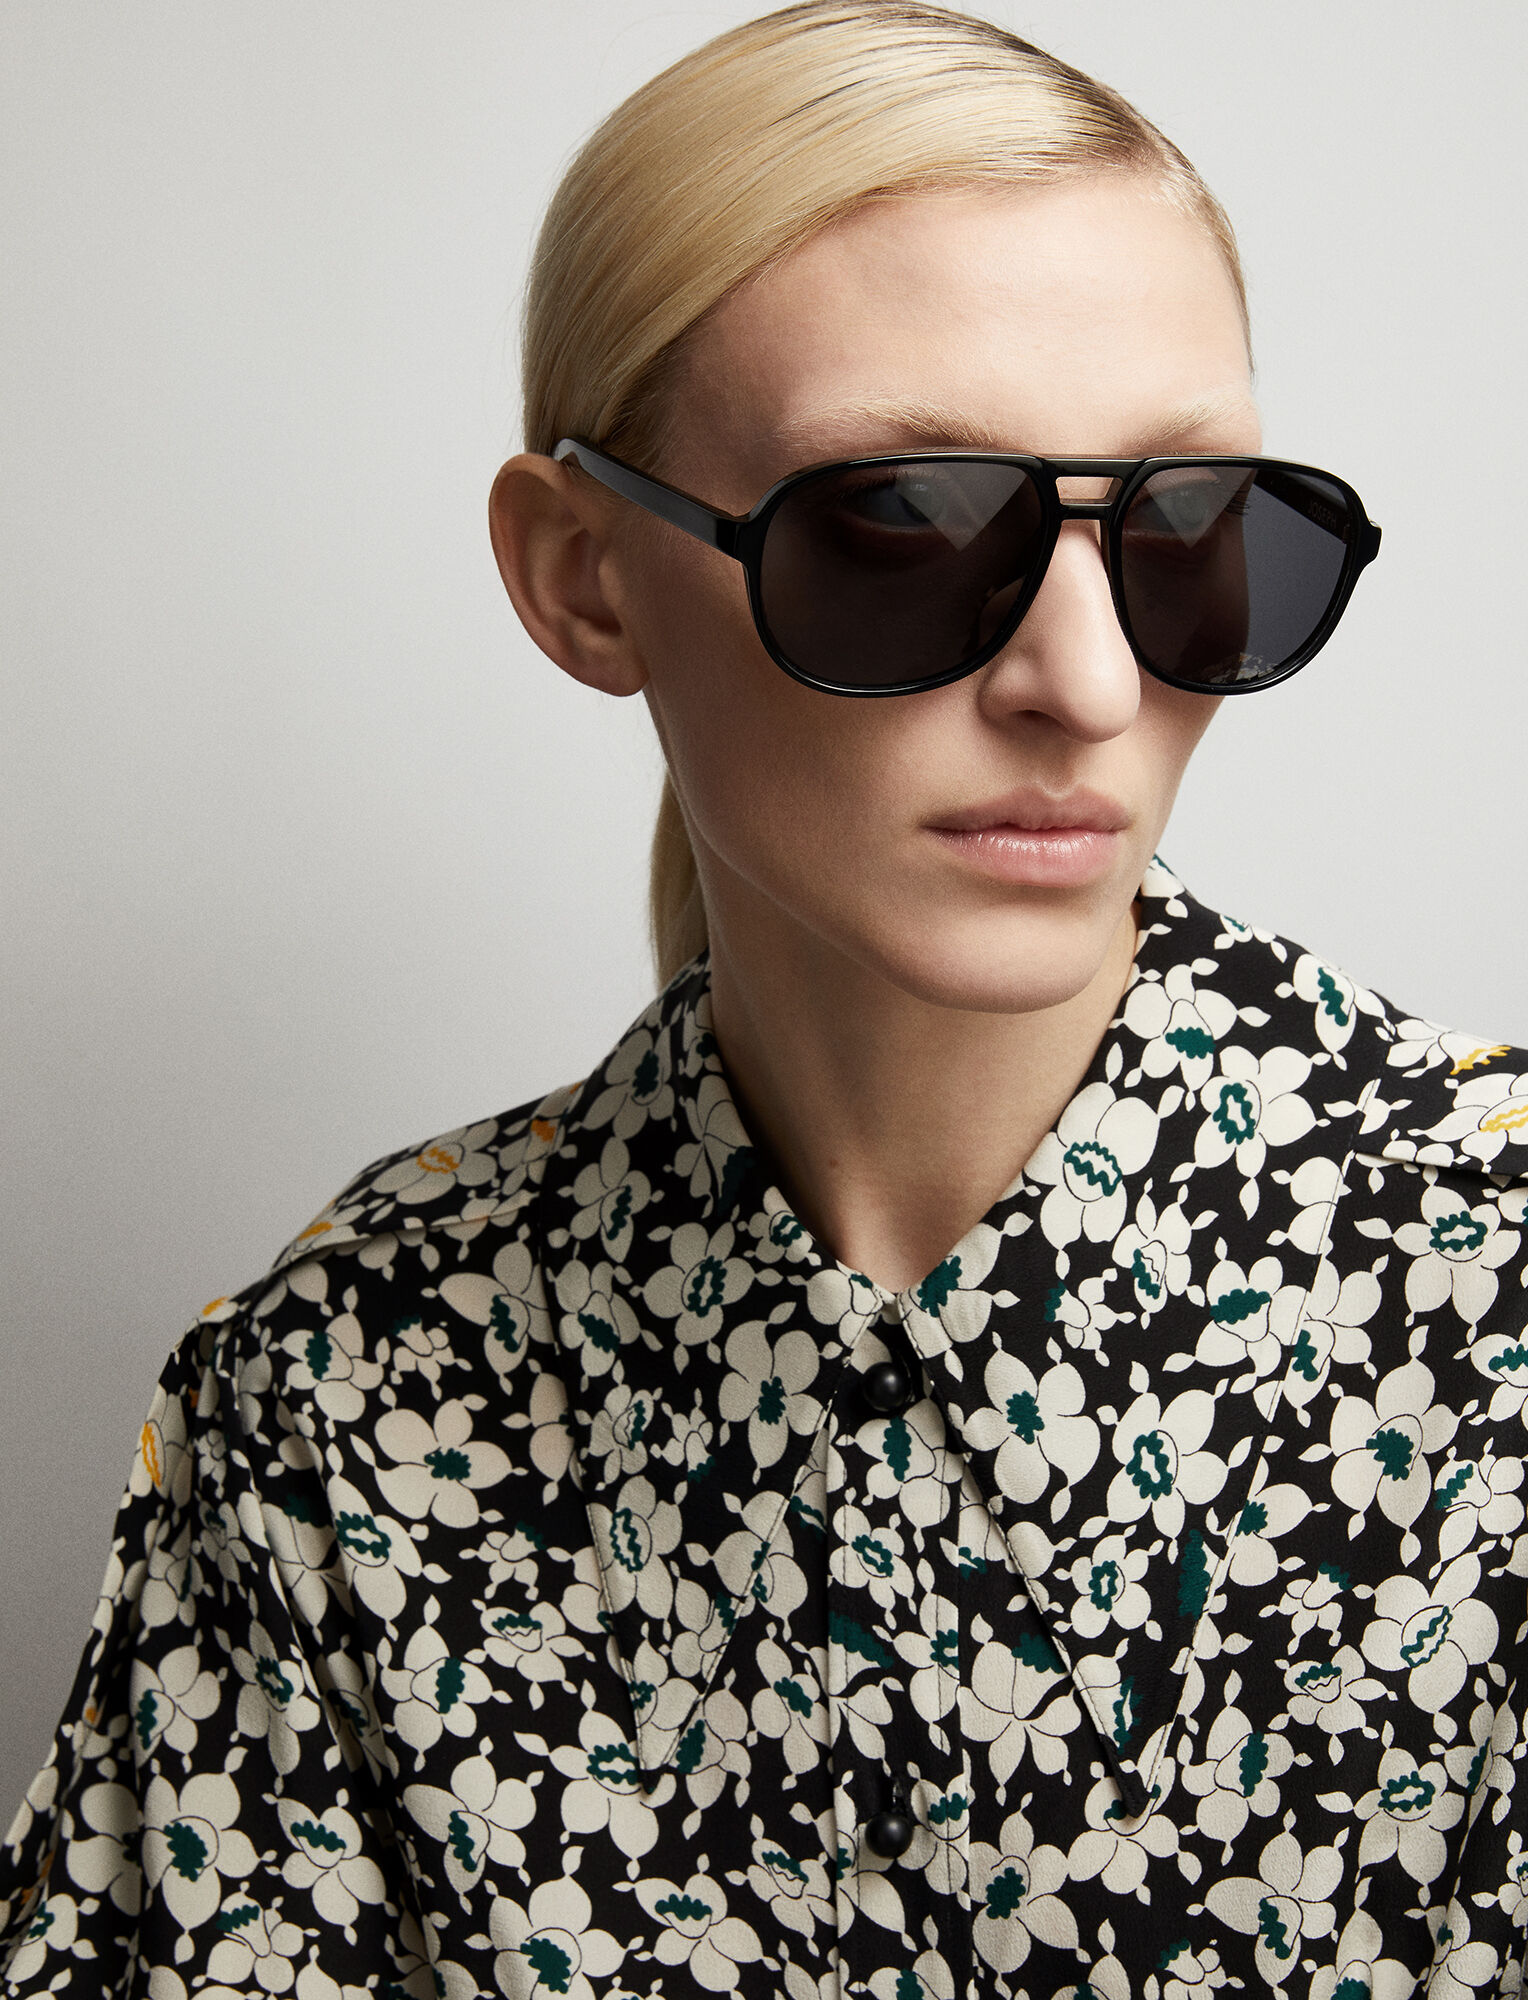 Sunglasses Joseph Brompton Brompton Joseph Black In Black Black Brompton Sunglasses In Sunglasses In 6U78Wqz8